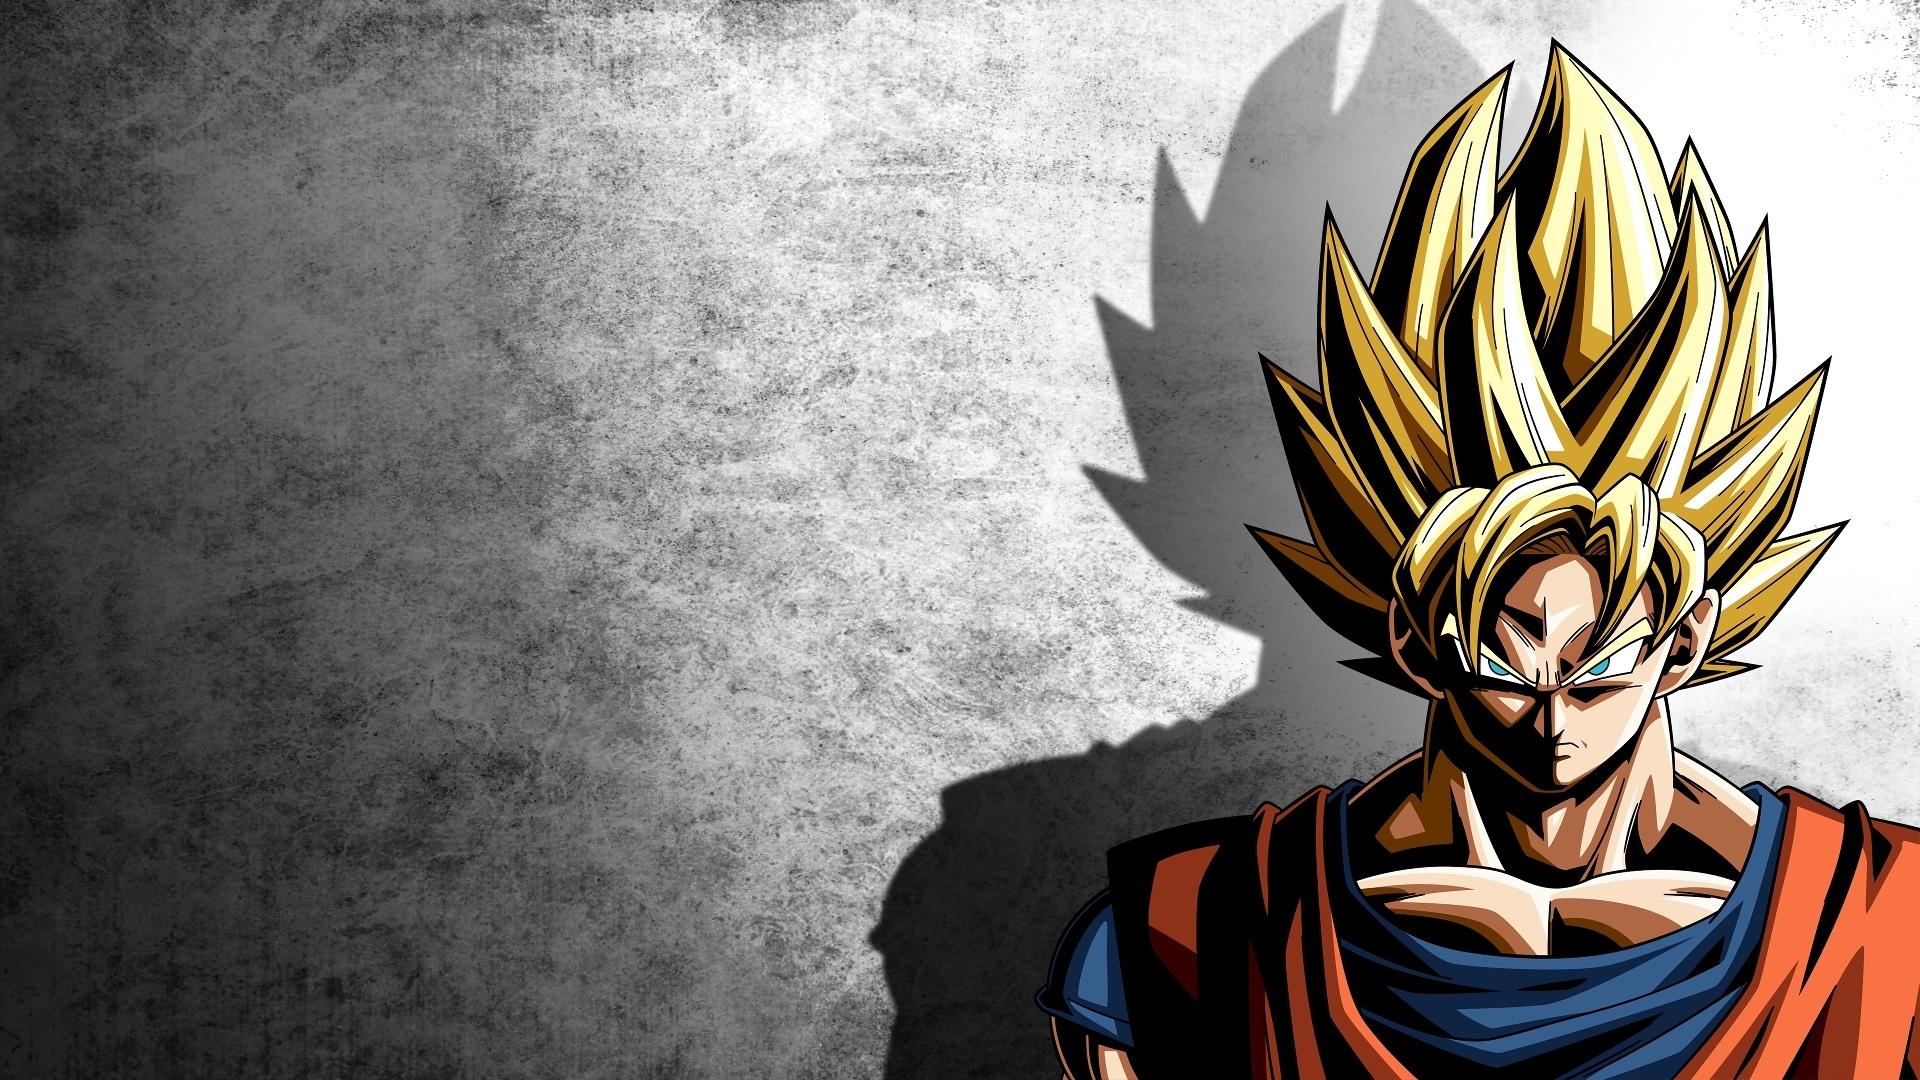 super sayain son goku dbx 2 game wallpaper #12566